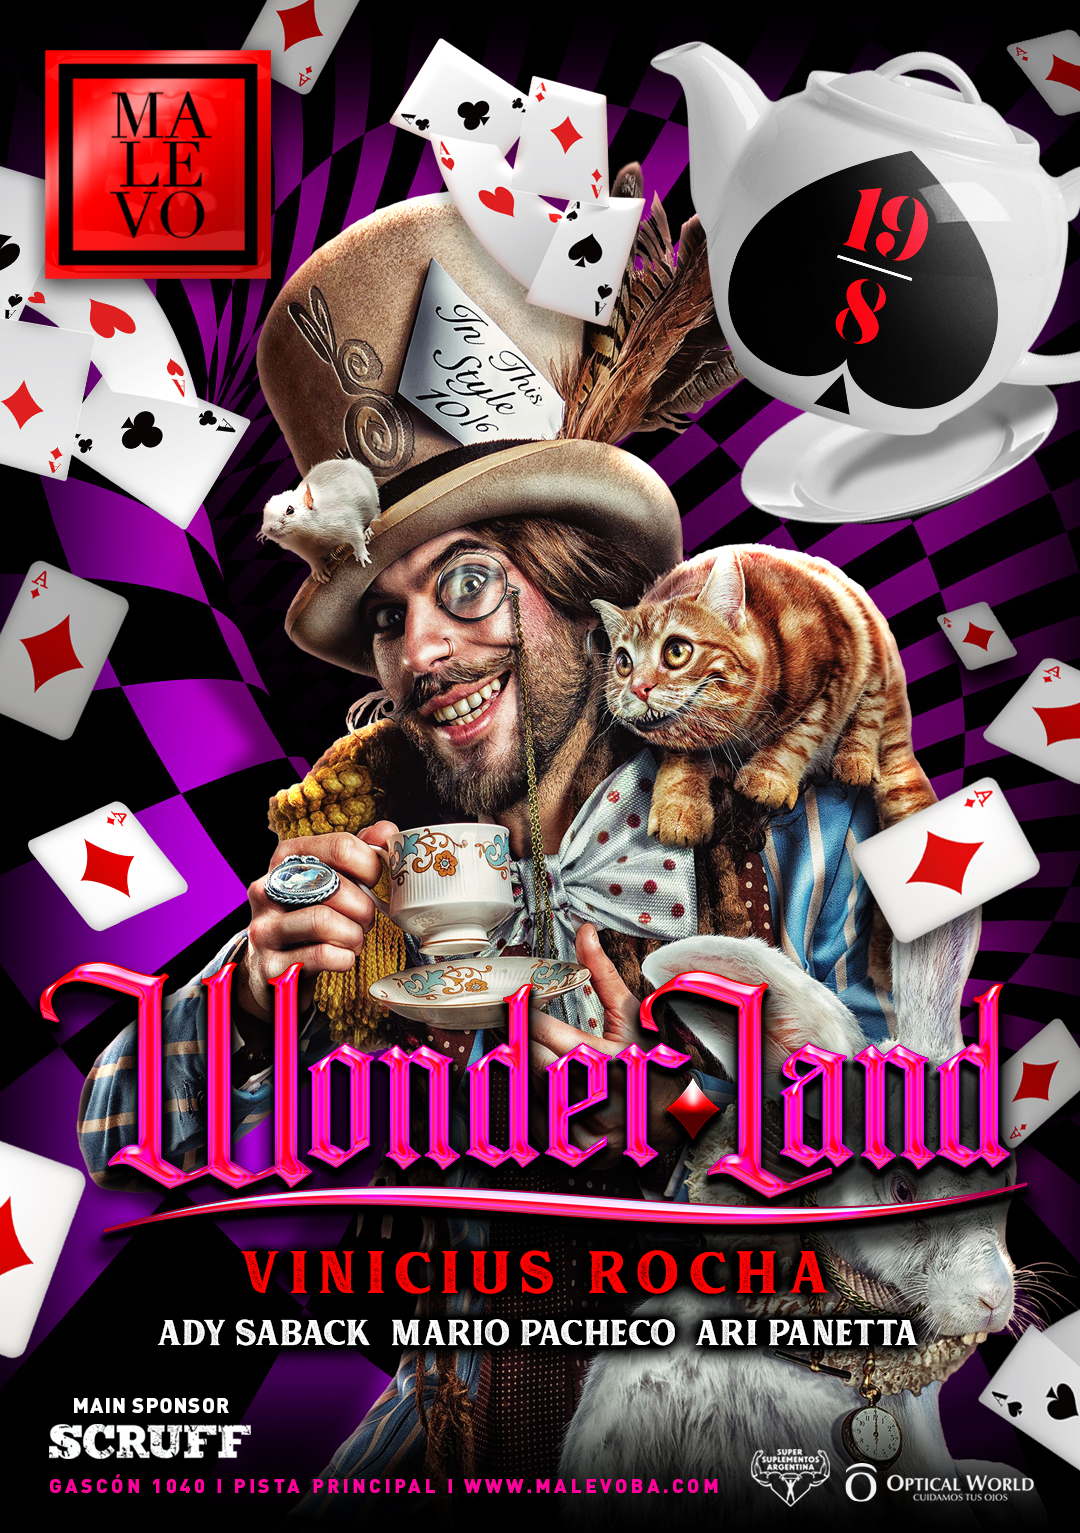 Malevo/Wonderland 19/8/18